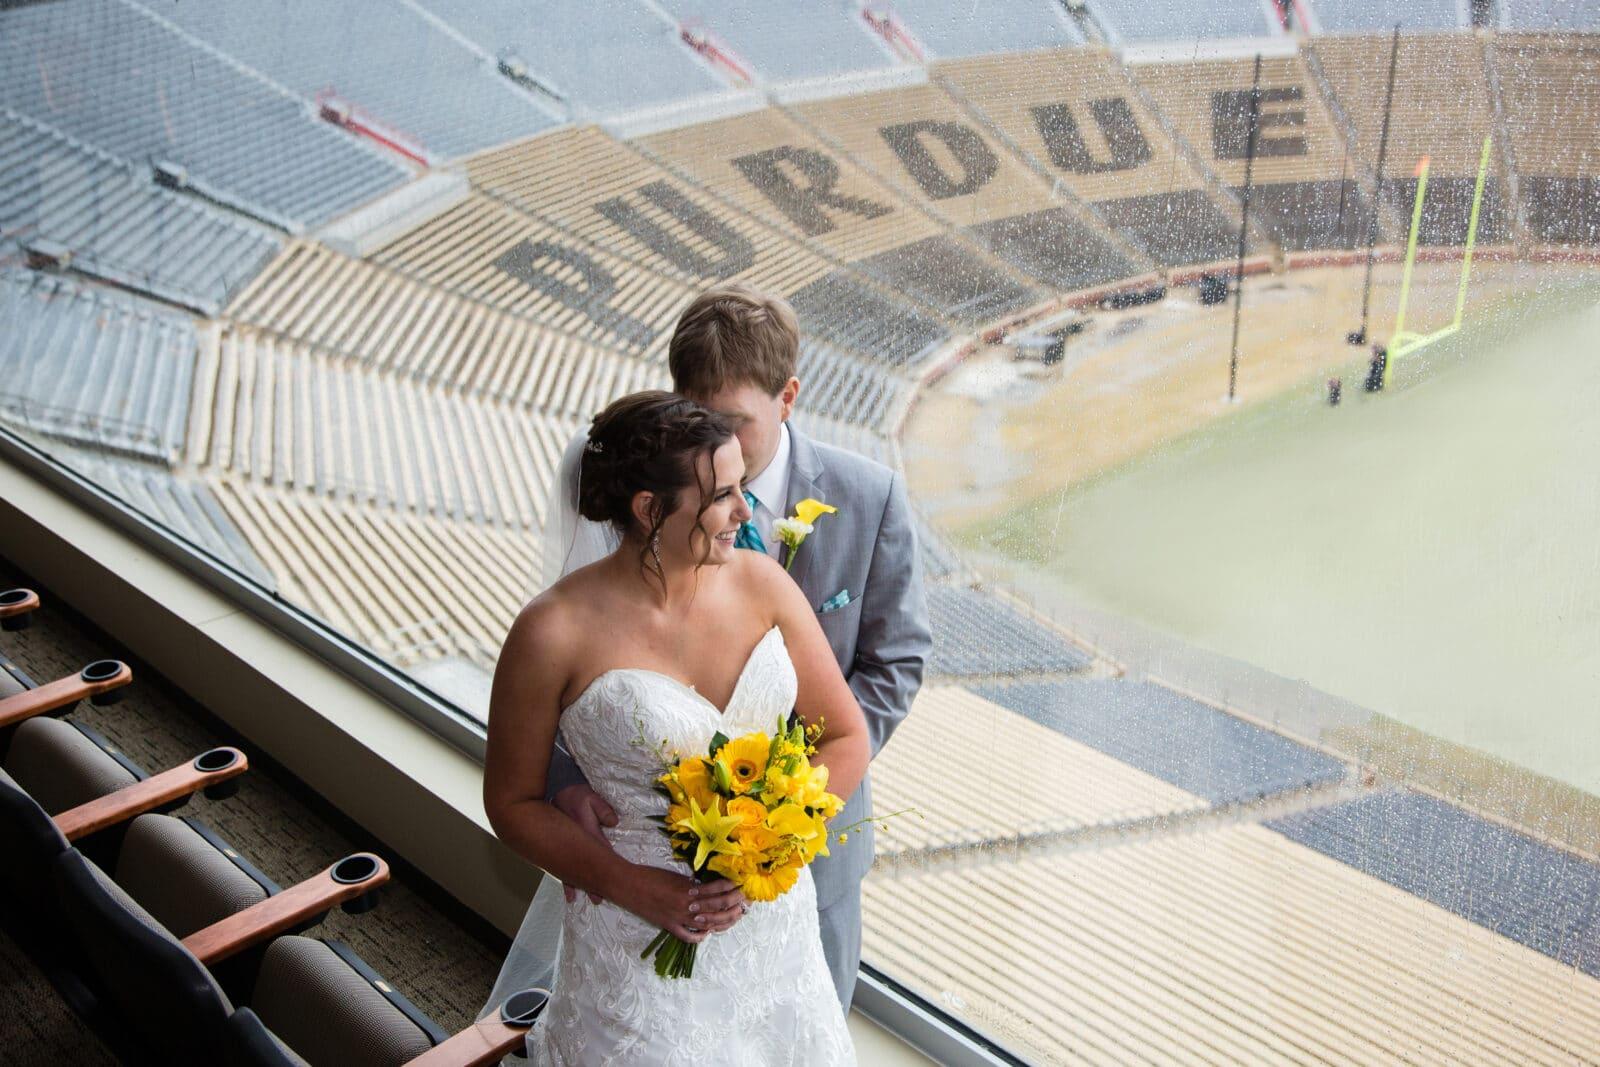 bride and groom pose at purdue university ross ade stadium